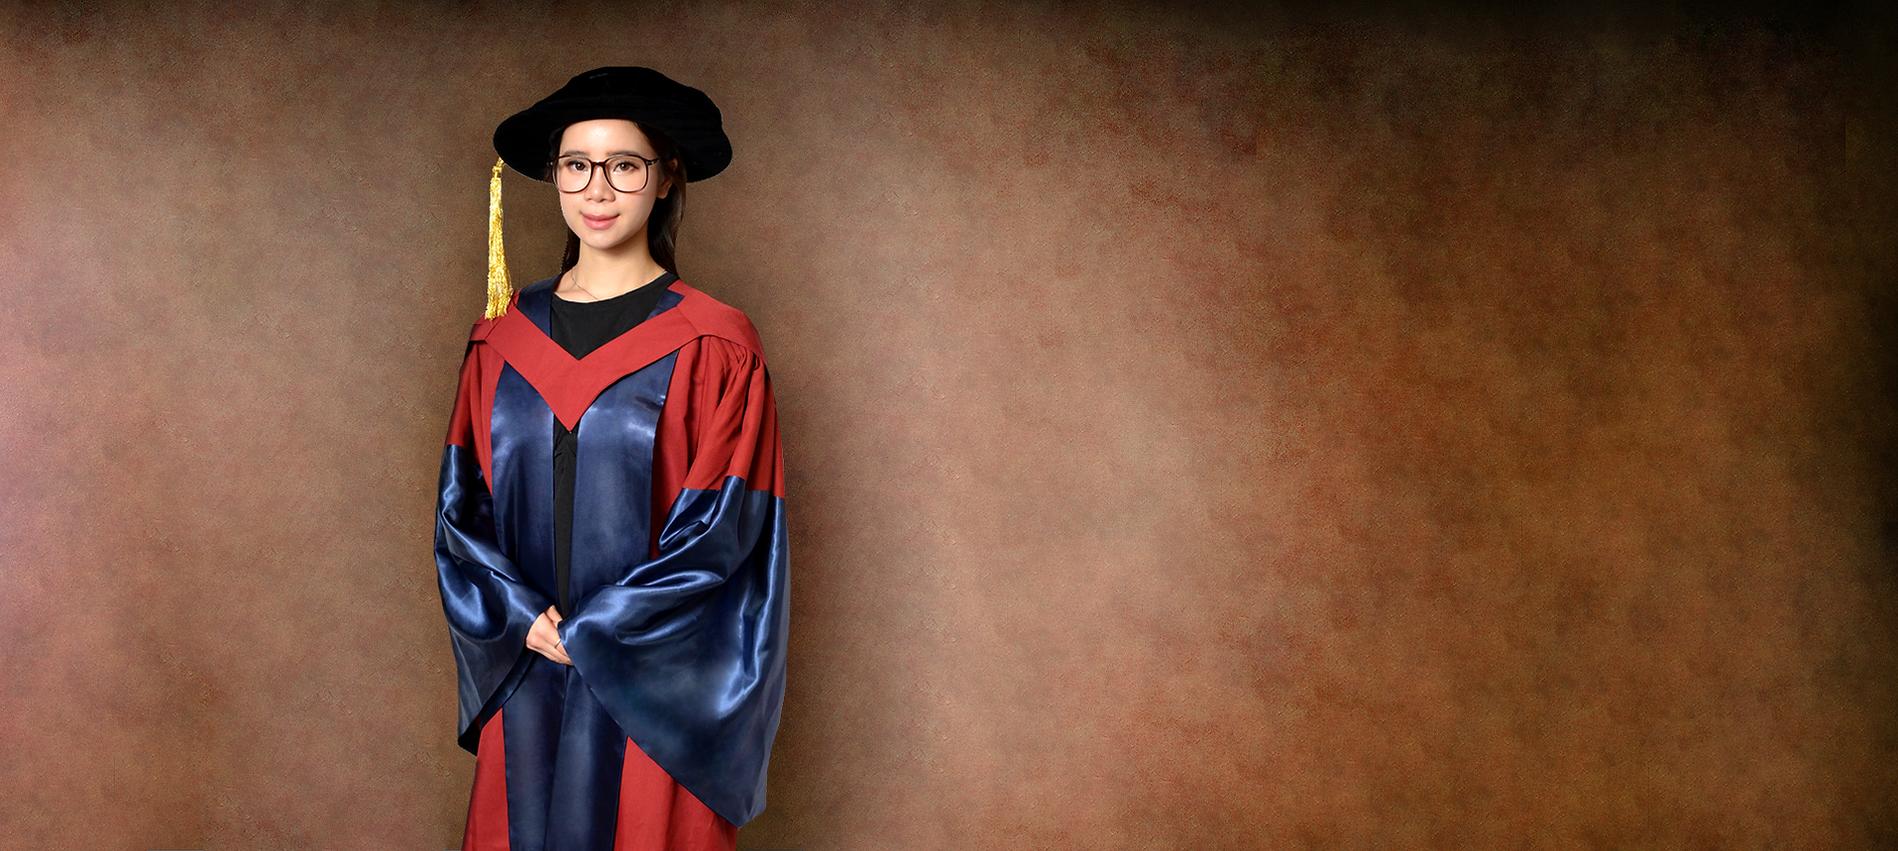 The Education University of Hong Kong ( EdUHK ) Graduation Gown | Academic Dress and Regalia 租借、購買香港教育大學 (教大 ) 畢業袍 | 學士、碩士、博士袍 | Rent or Buy